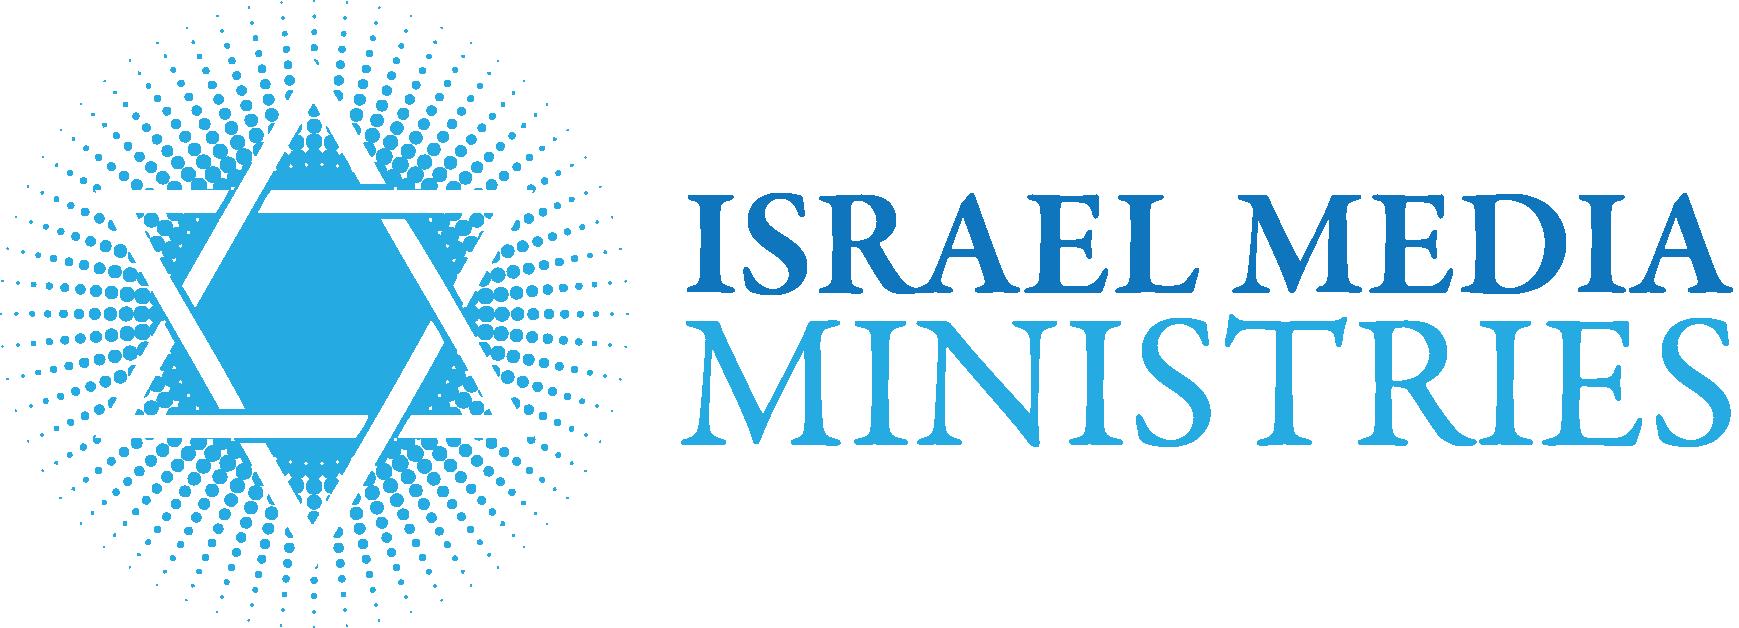 Israel Media Ministries